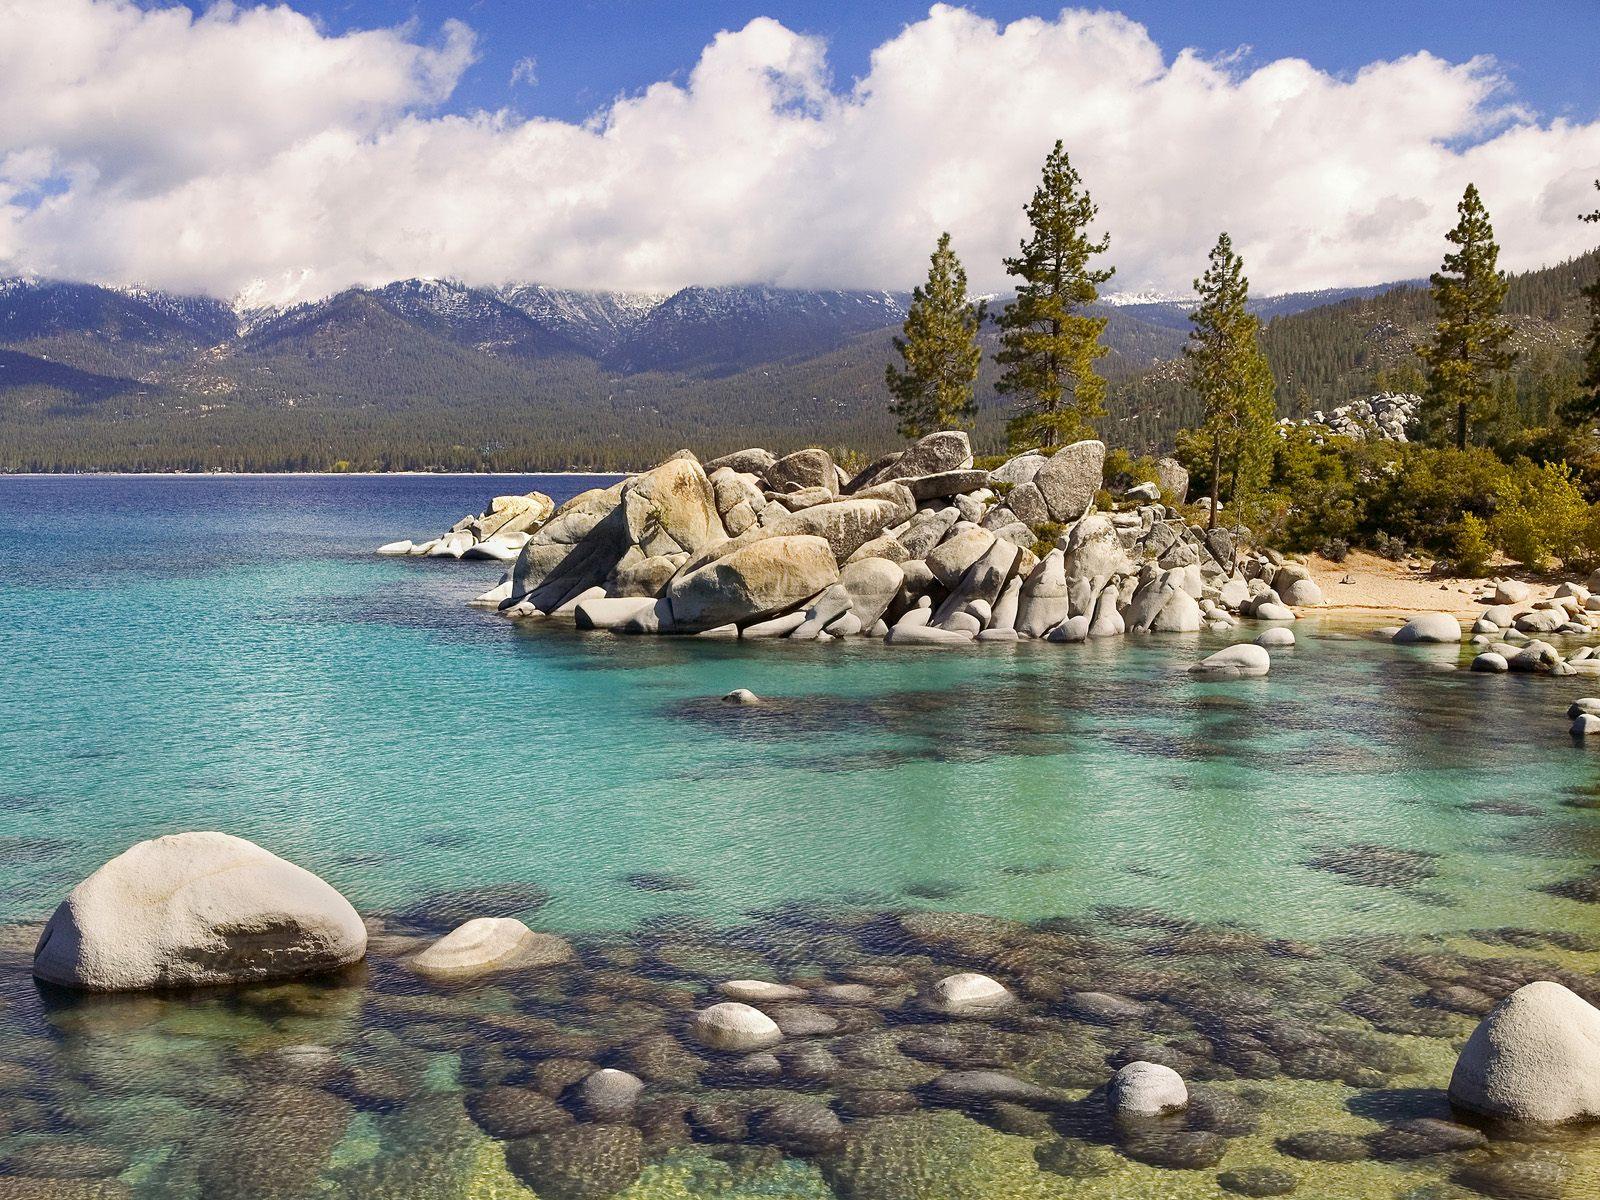 http://4.bp.blogspot.com/_HkbWdsz-H8g/S74GadeO0PI/AAAAAAAAImc/xnNfcVqyWoQ/s1600/Sand+Harbor+State+Park,+Lake+Tahoe,+Nevada.jpg